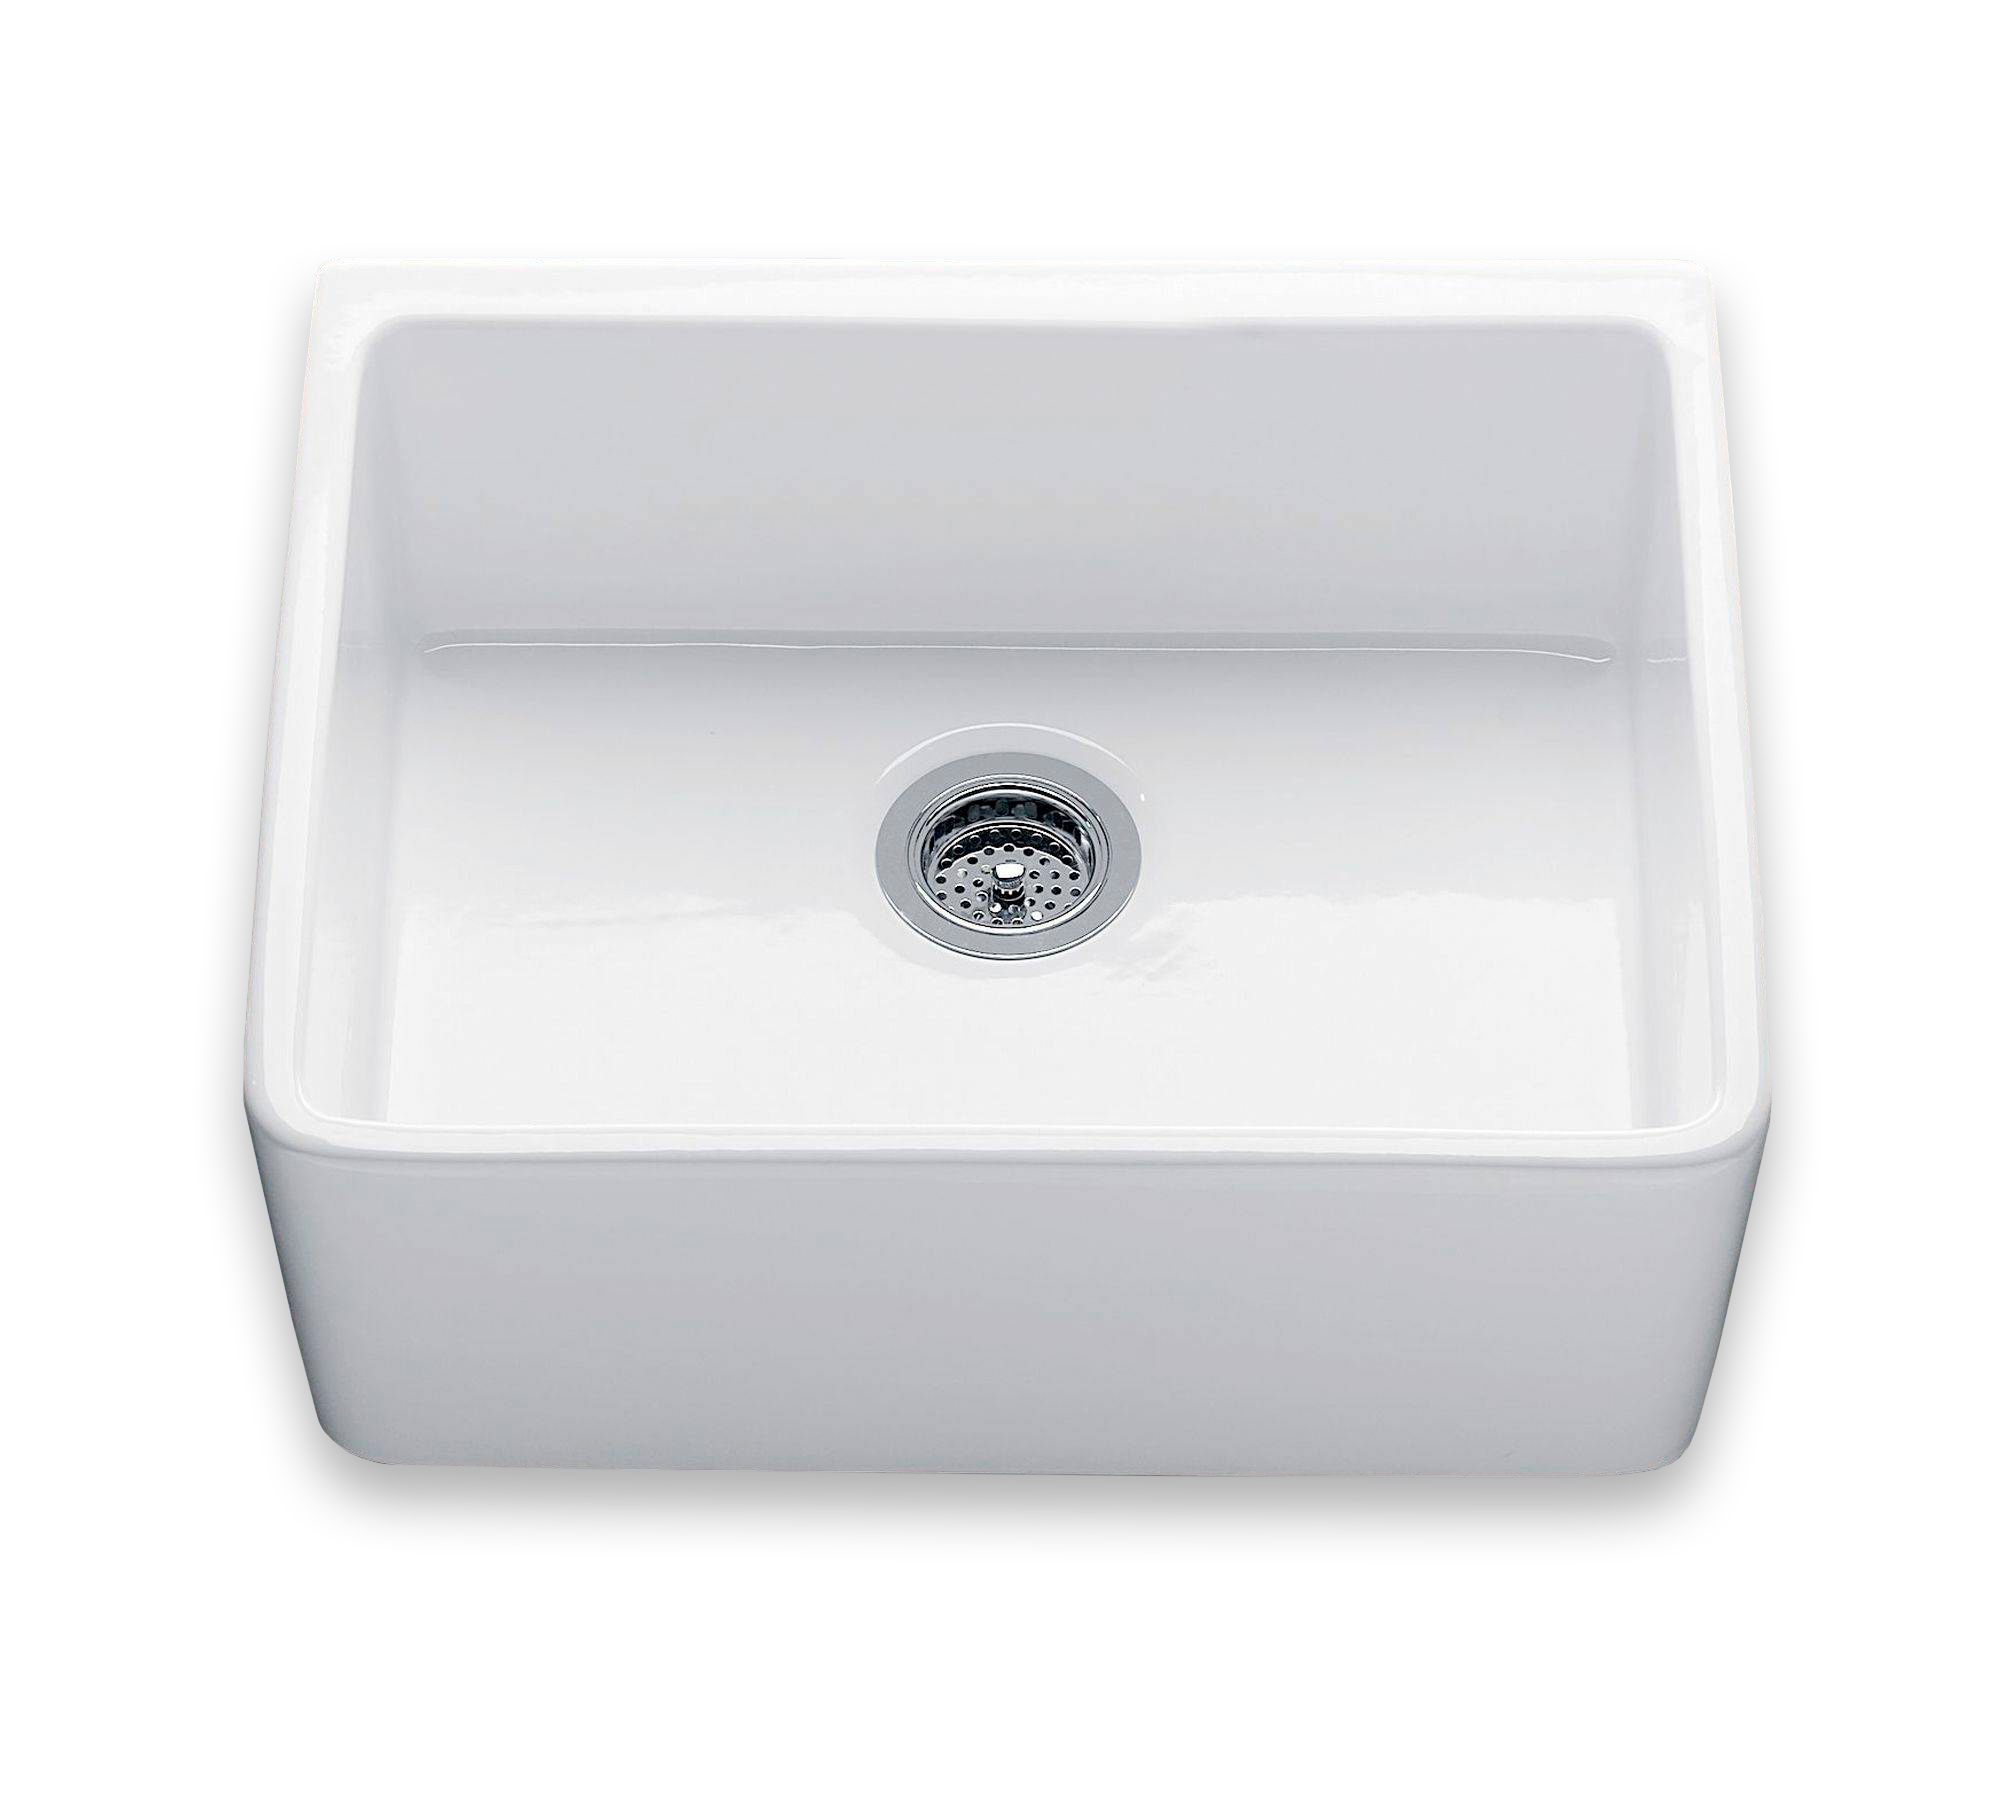 Kuchenspule Single Butler Aus Keramik In Weiss Traditional Bathrooms